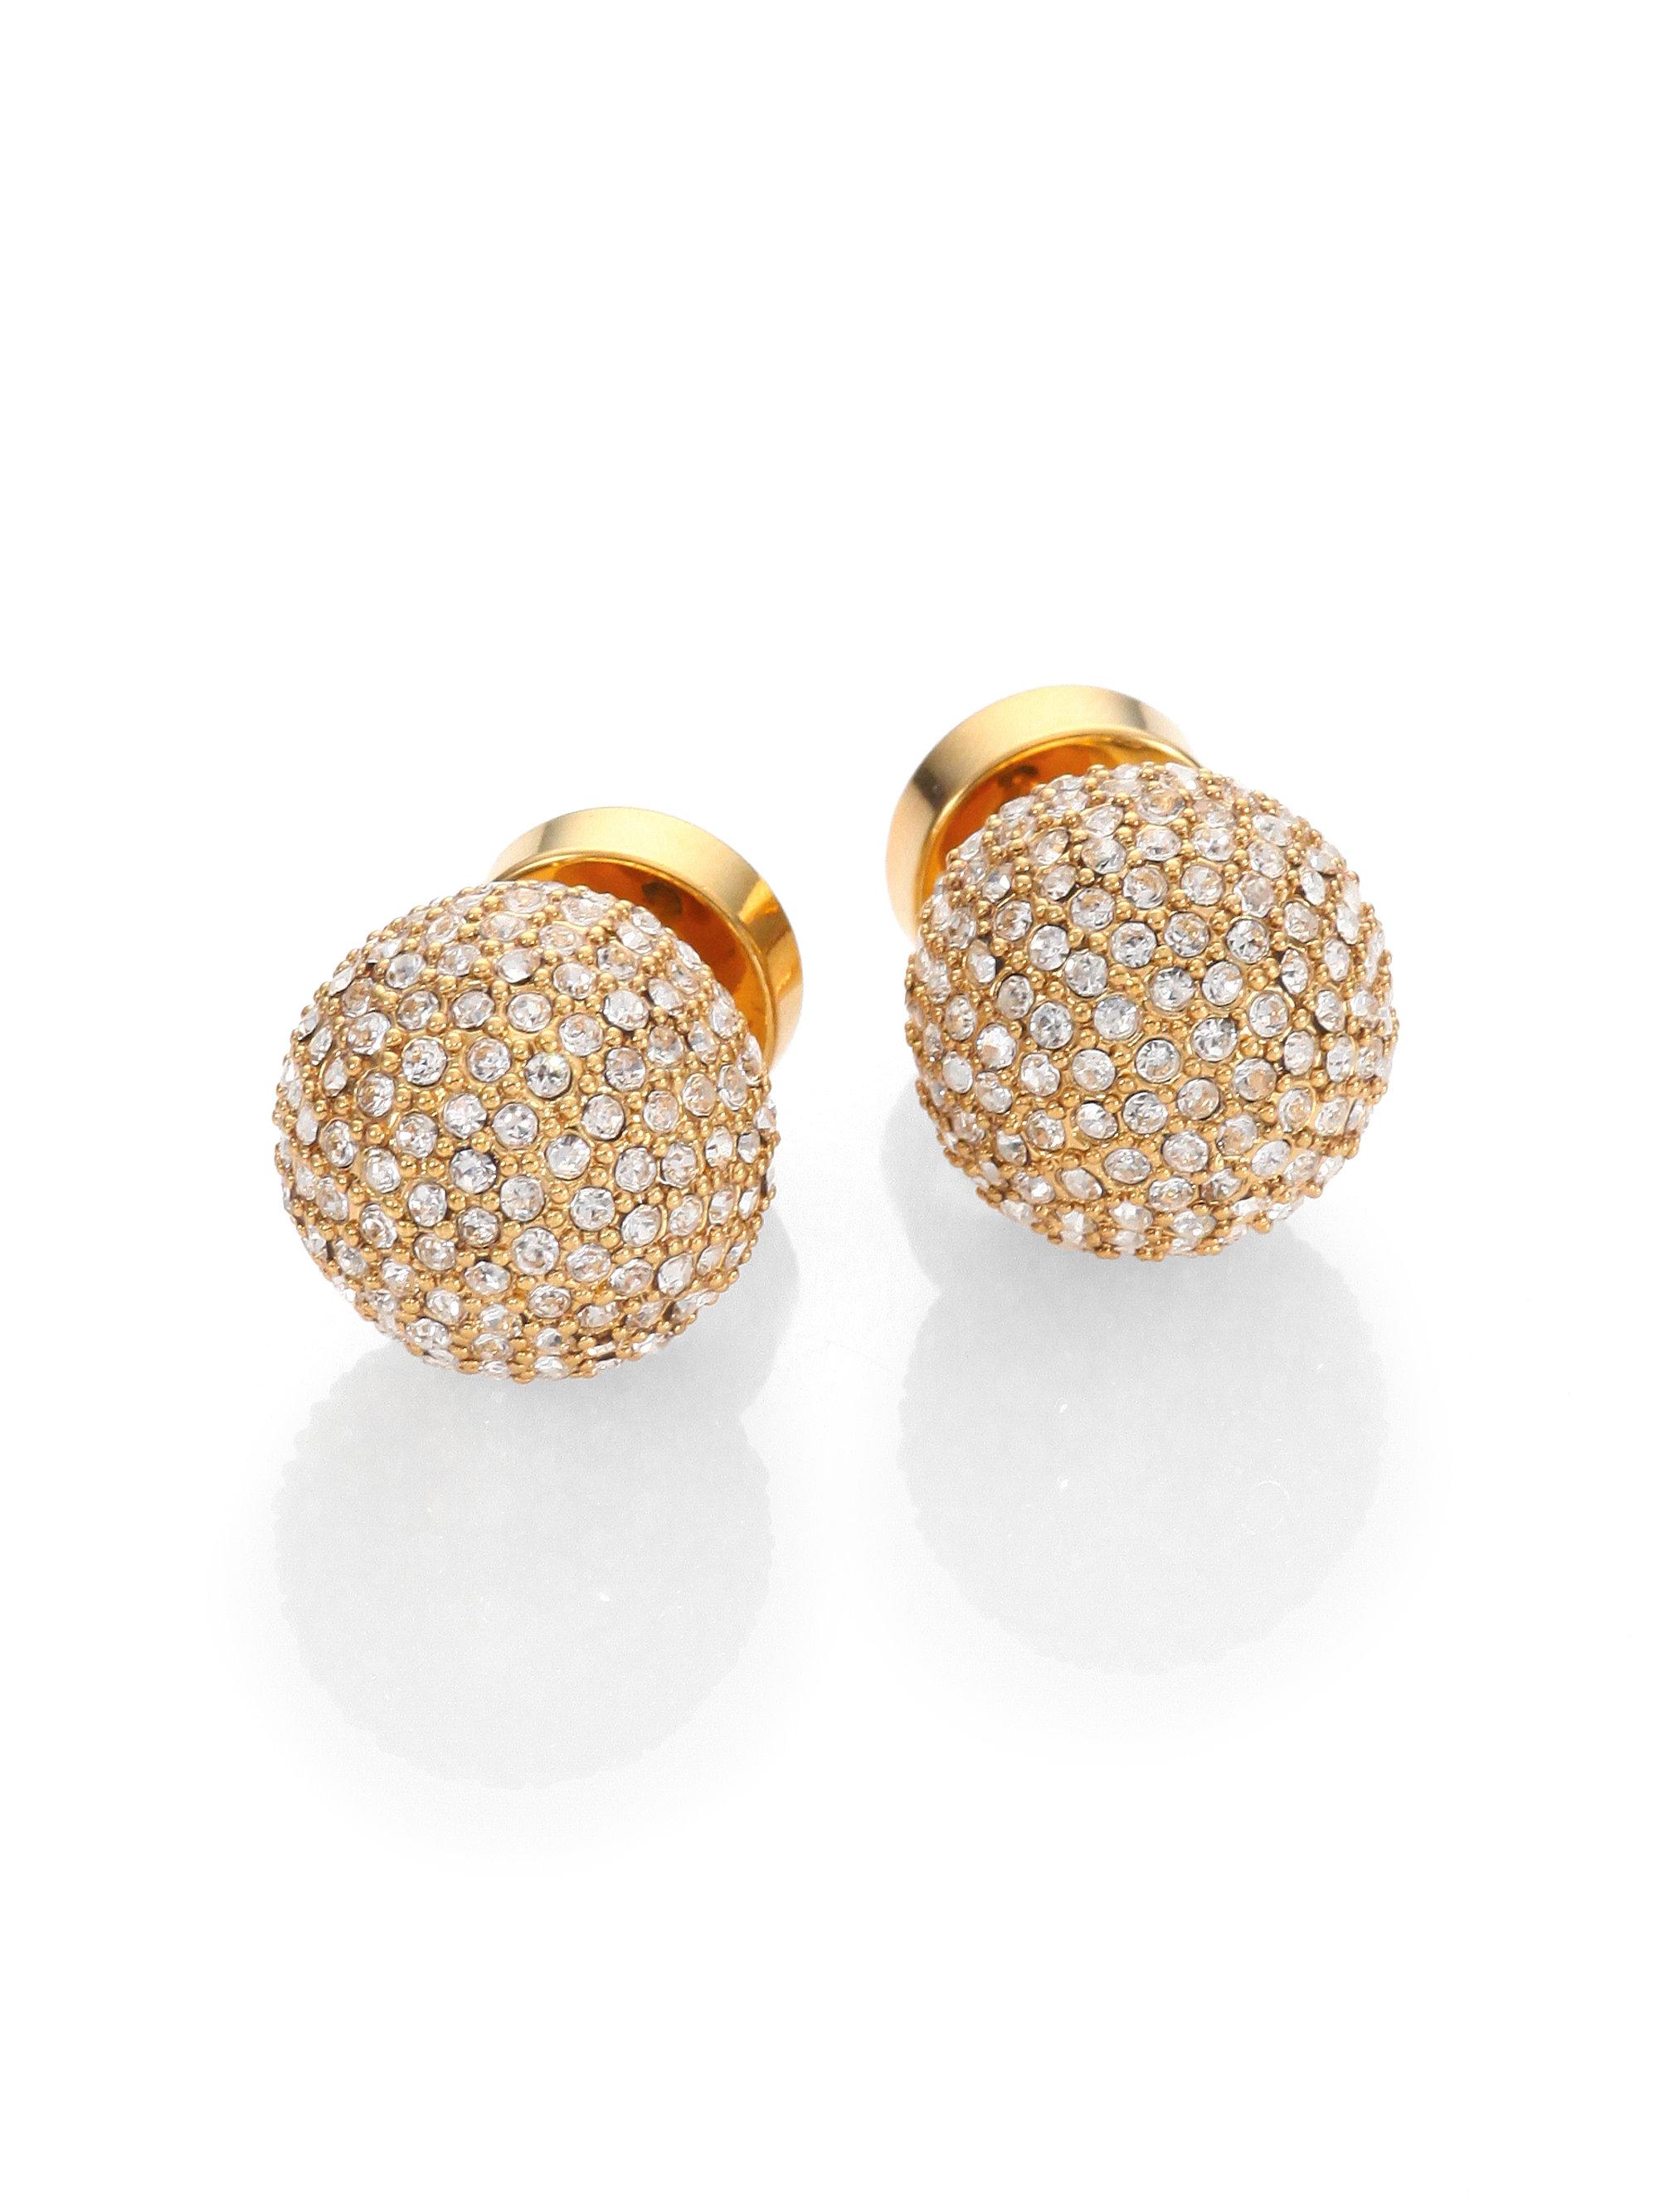 Michael kors Pave Ball Stud Earrings in Metallic